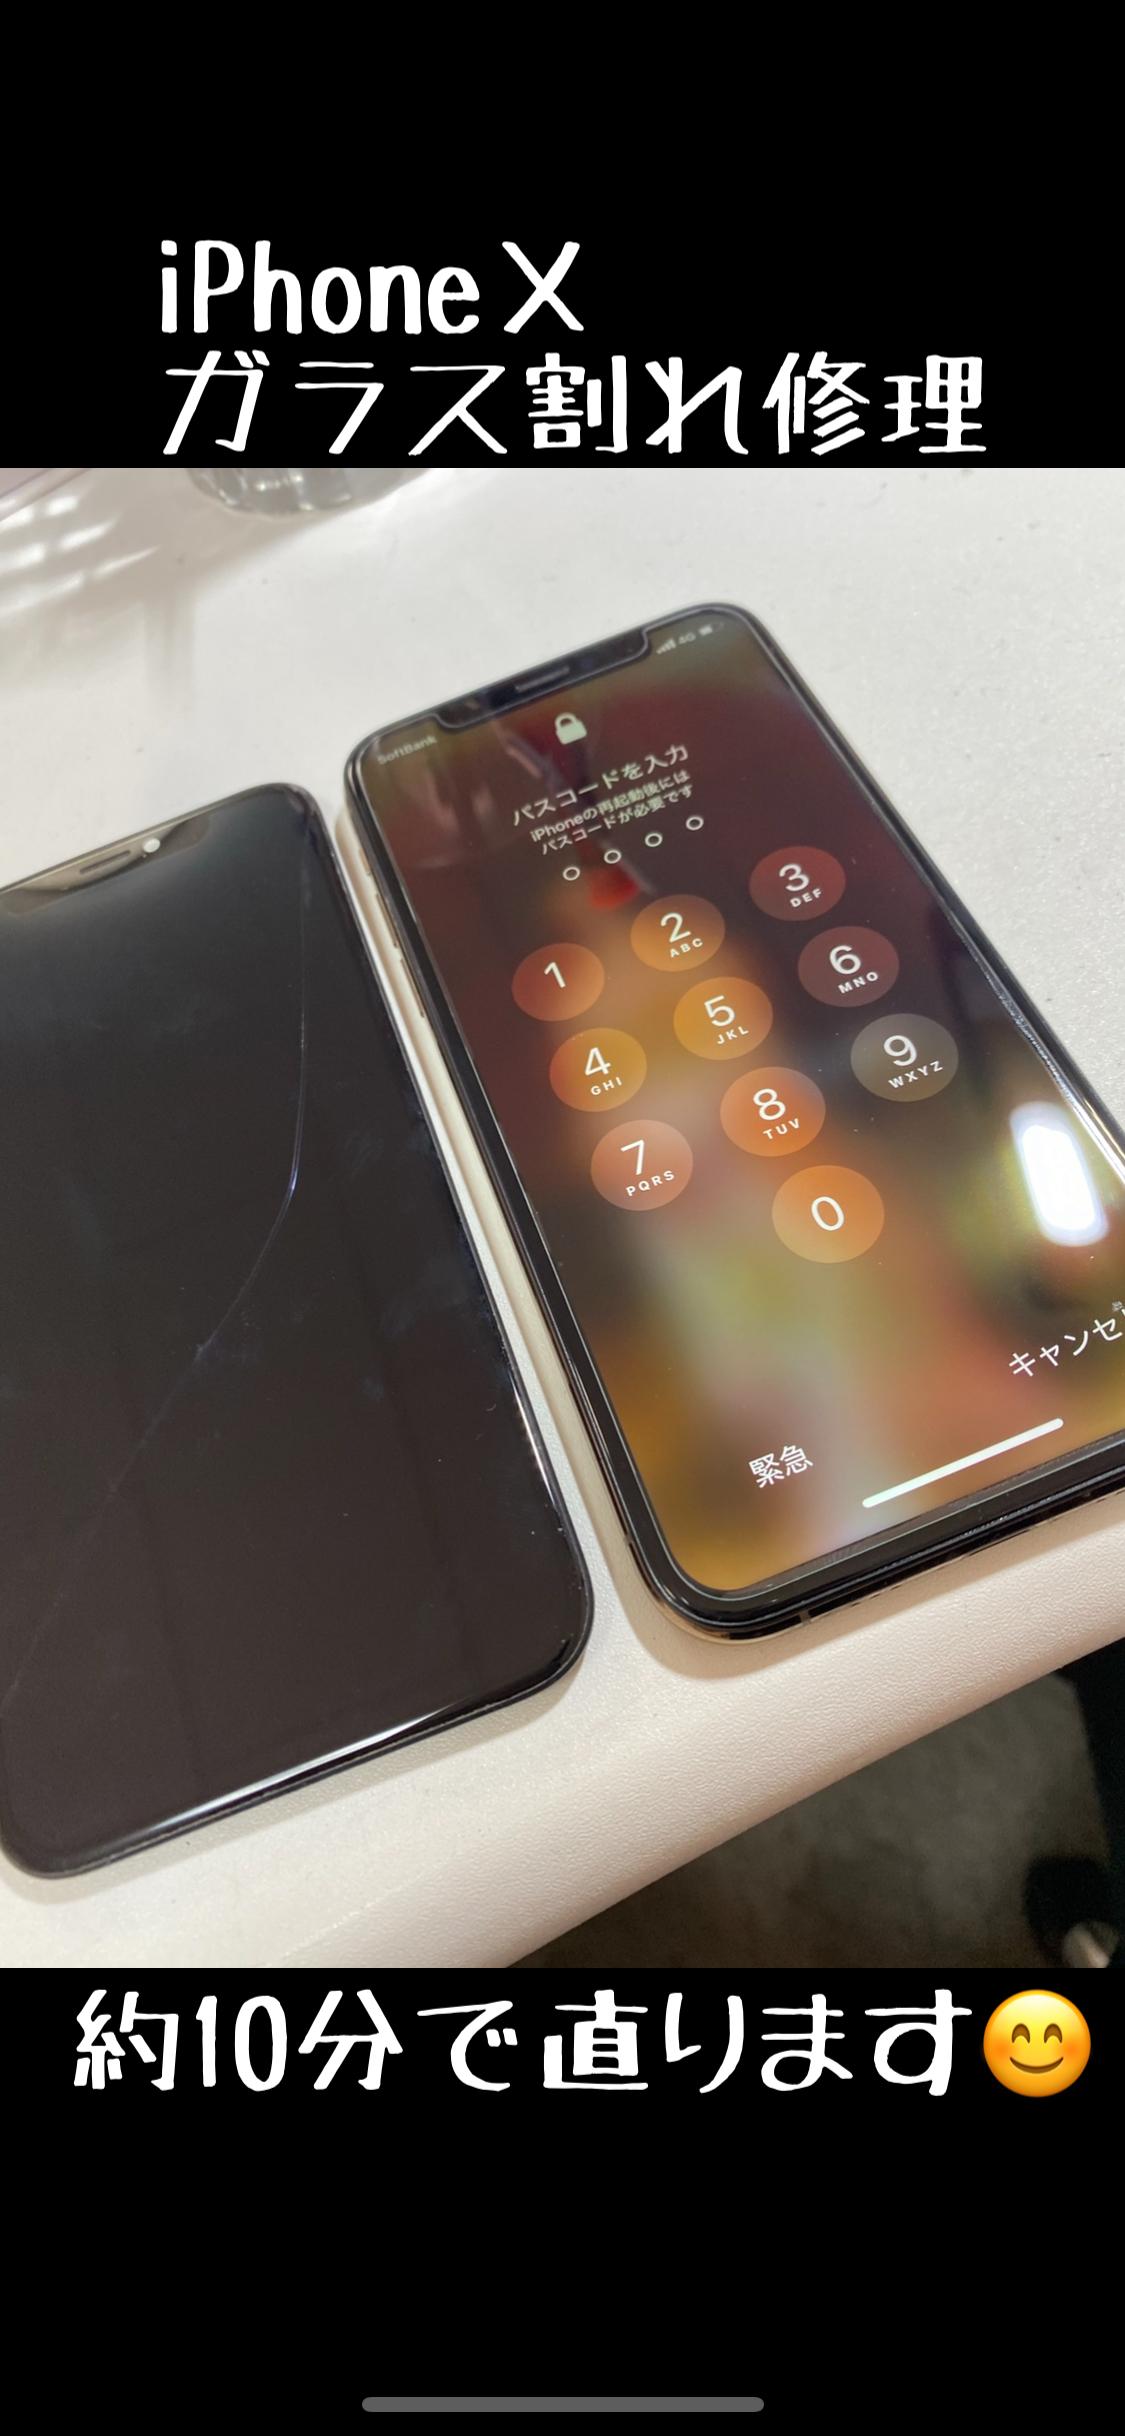 iPhoneX アイフォンテン ガラス交換 パネル交換 液晶不良 江南市 江南 iPhone修理 アイフォン修理